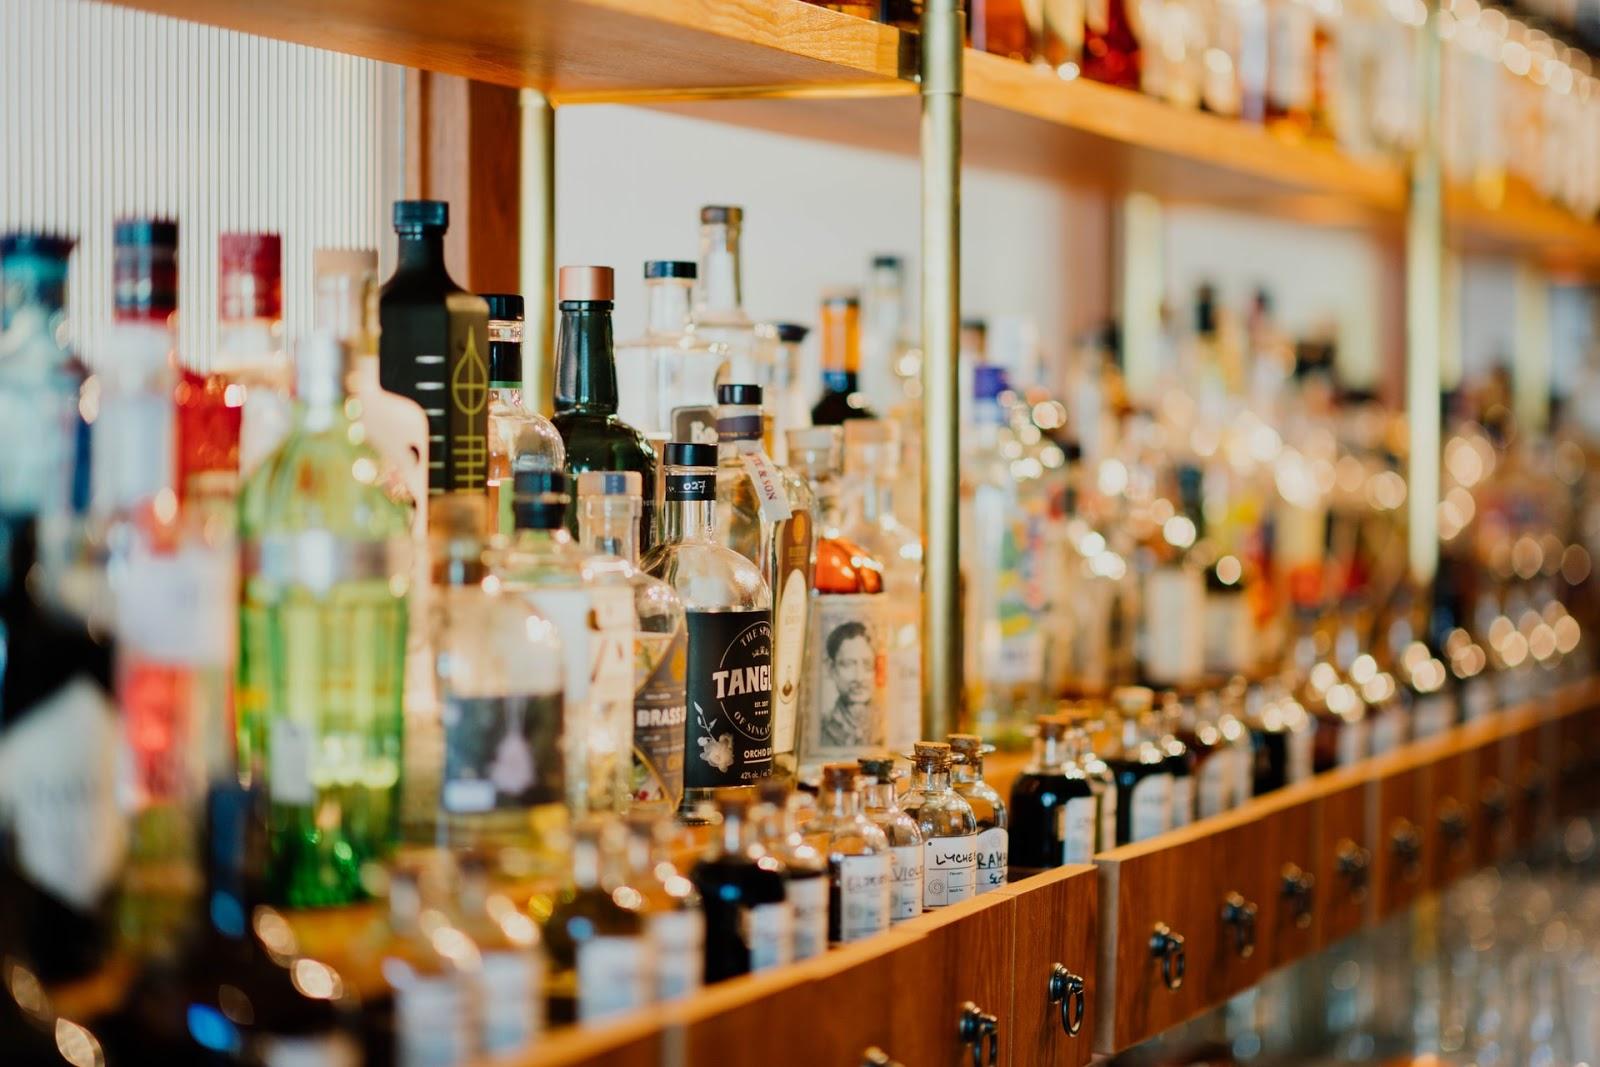 A nice bar lineup representing alcohol.